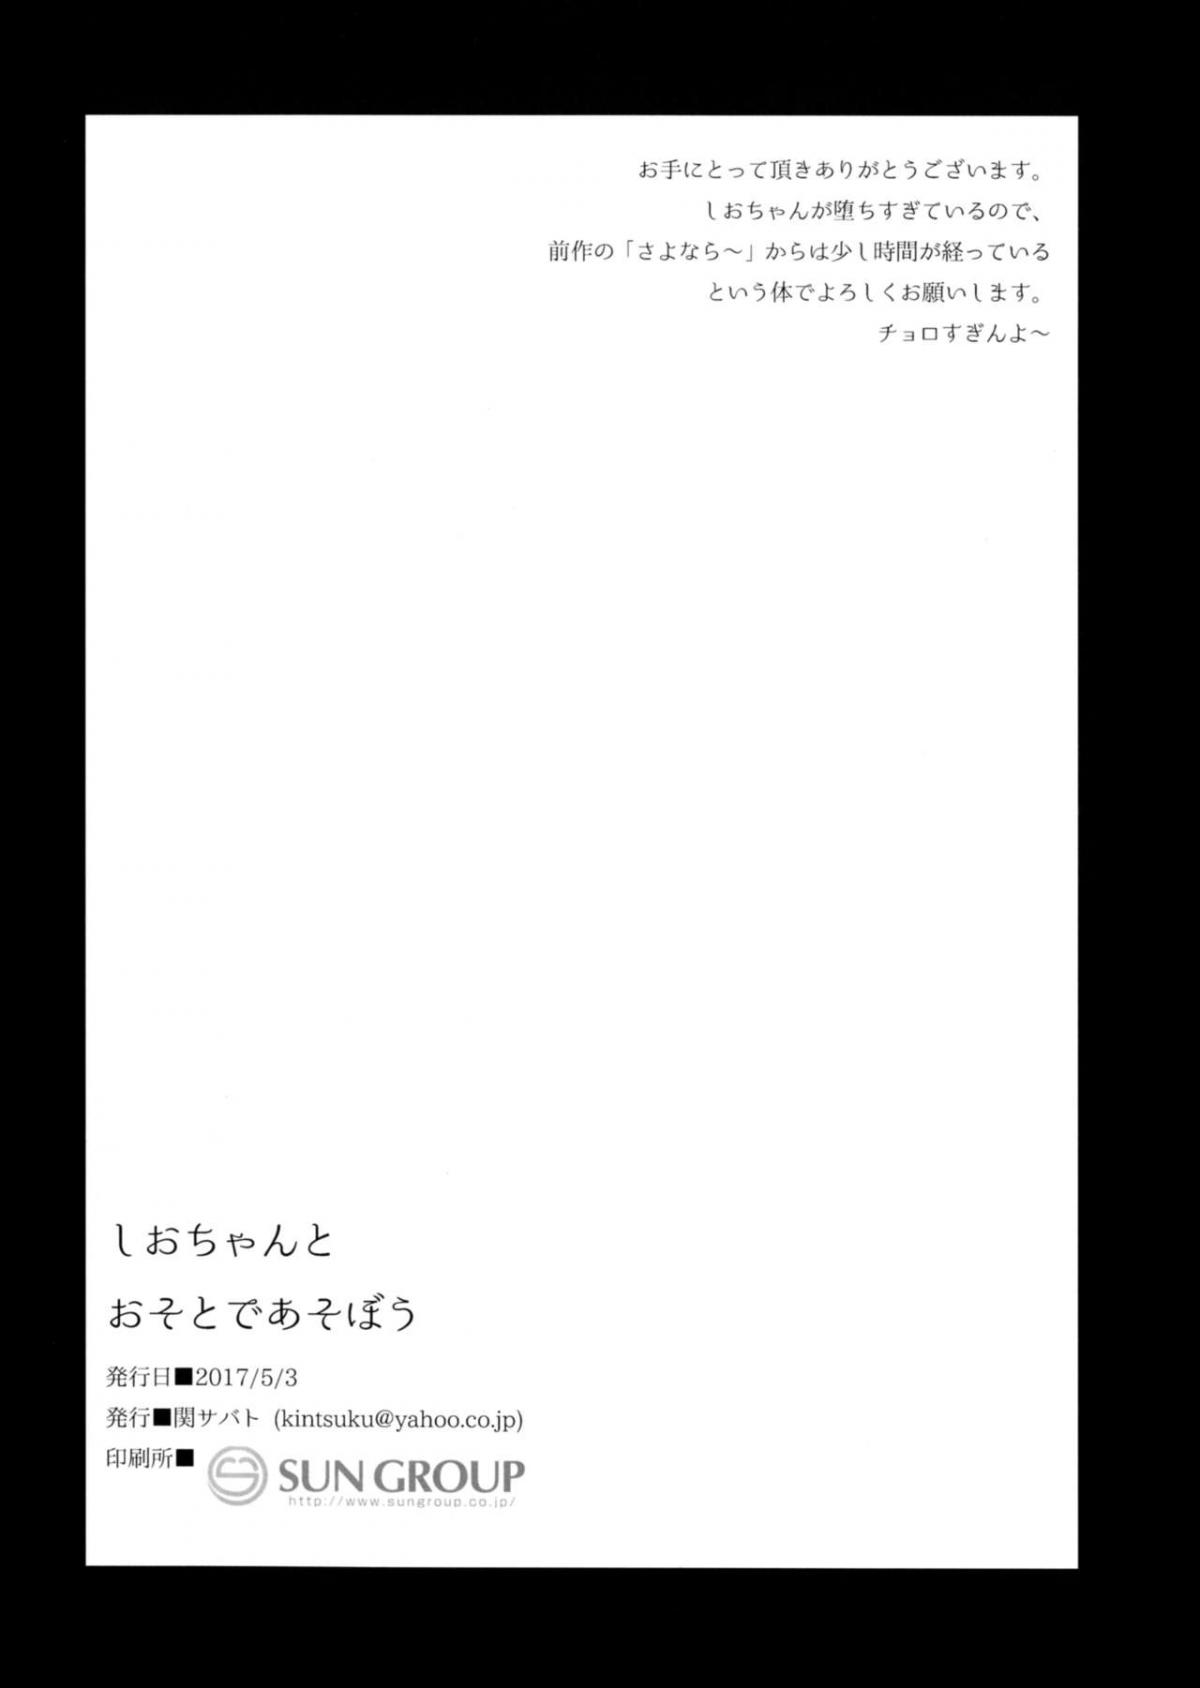 HentaiVN.net - Ảnh 24 - Shio-chan to Osoto de Asobou - Oneshot